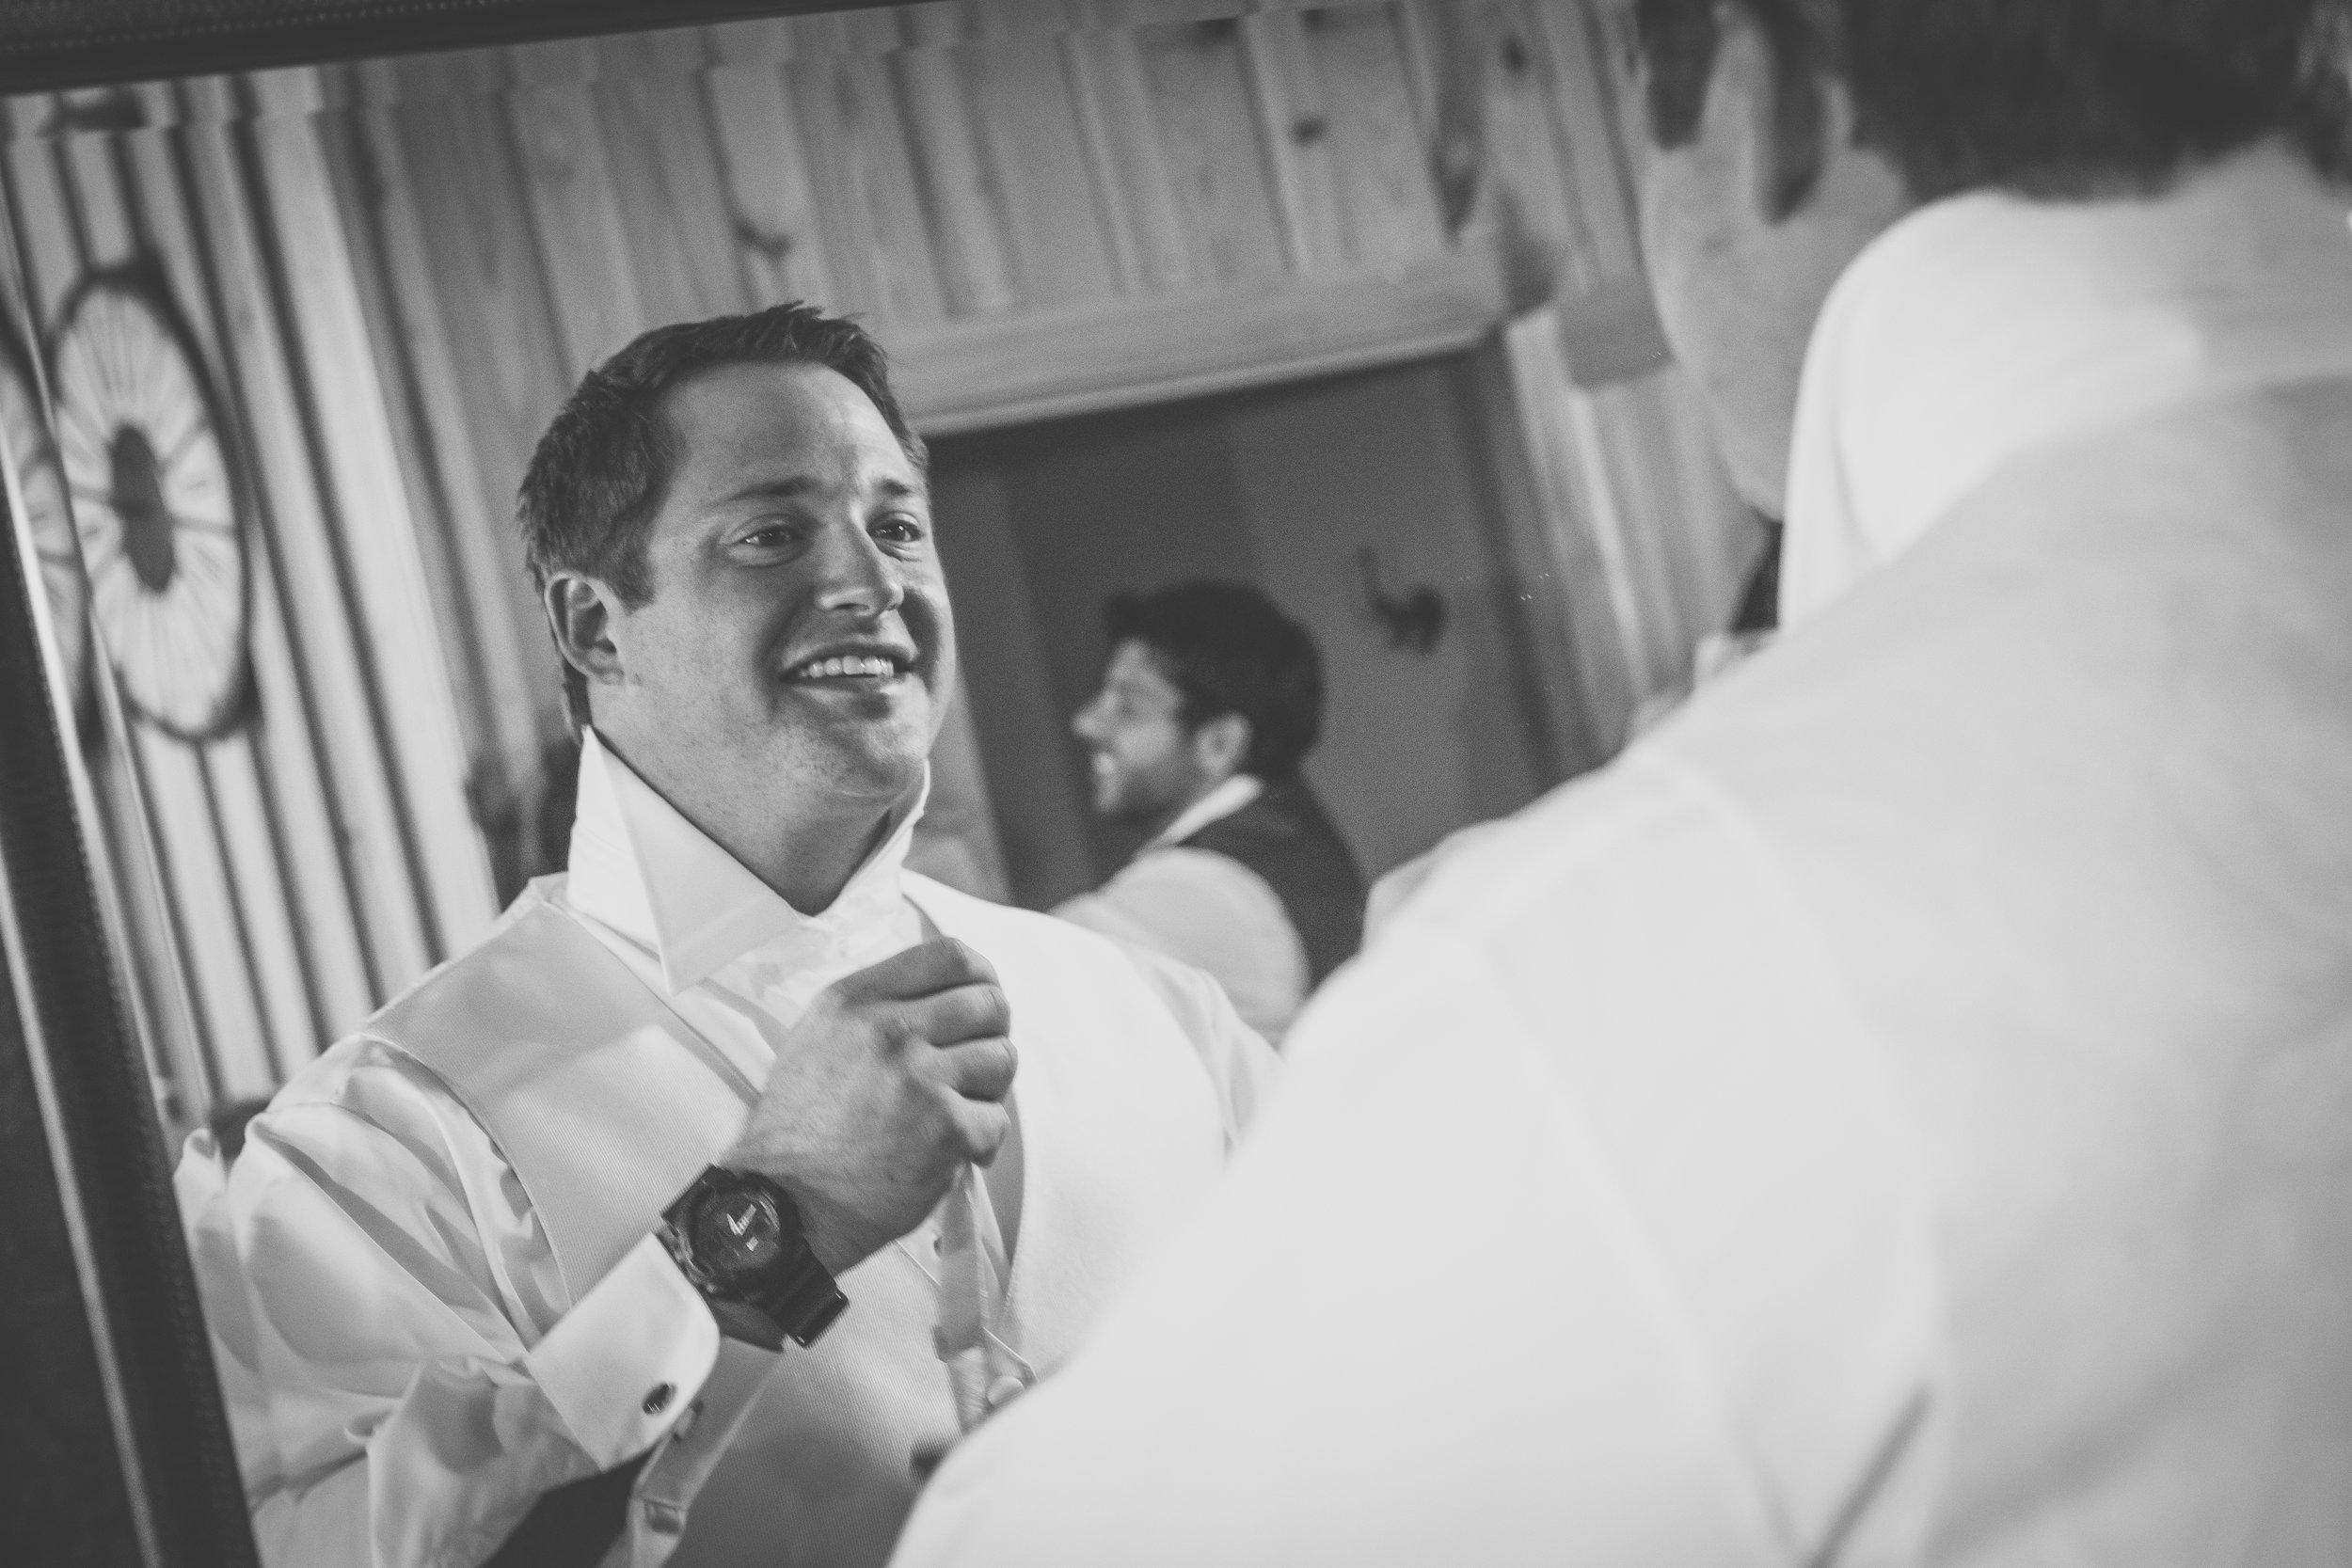 WeddingPhotographerAubrey.jpg